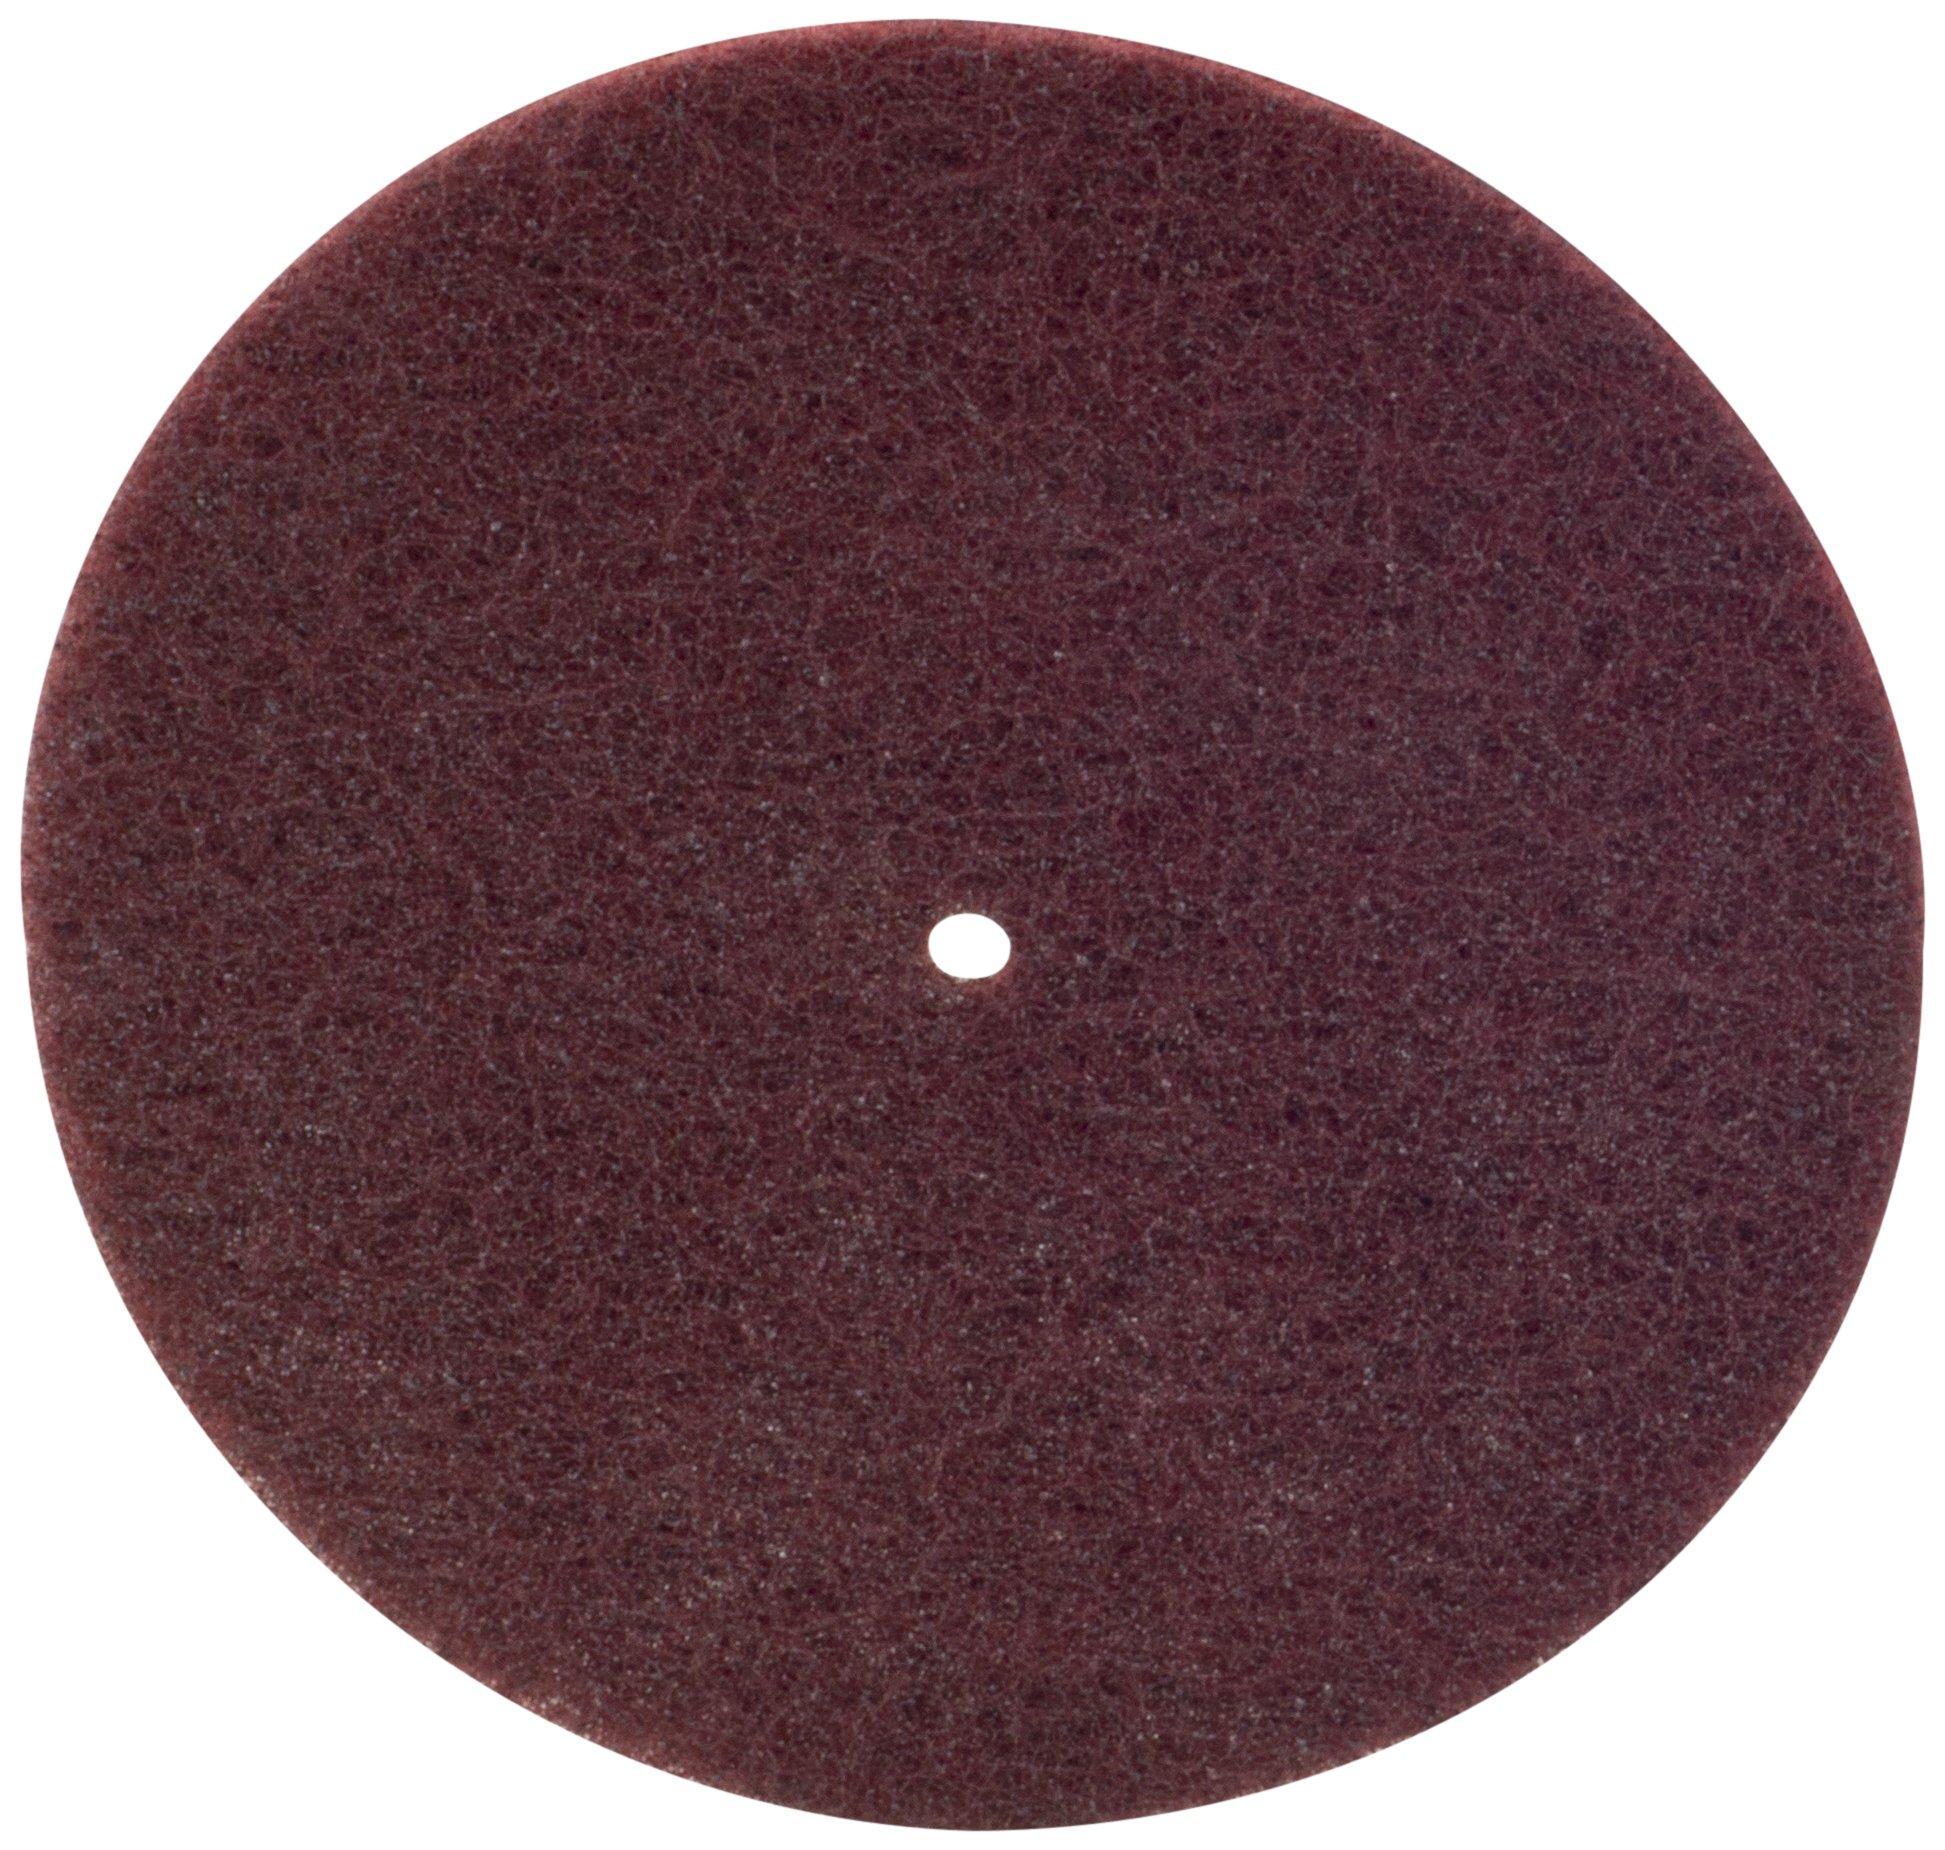 Scotch-Brite(TM) Light Deburring Disc, Aluminum Oxide, 6 Diameter, 1/2 Arbor, A Very Fine Grit (Pack of 100) by Cubitron